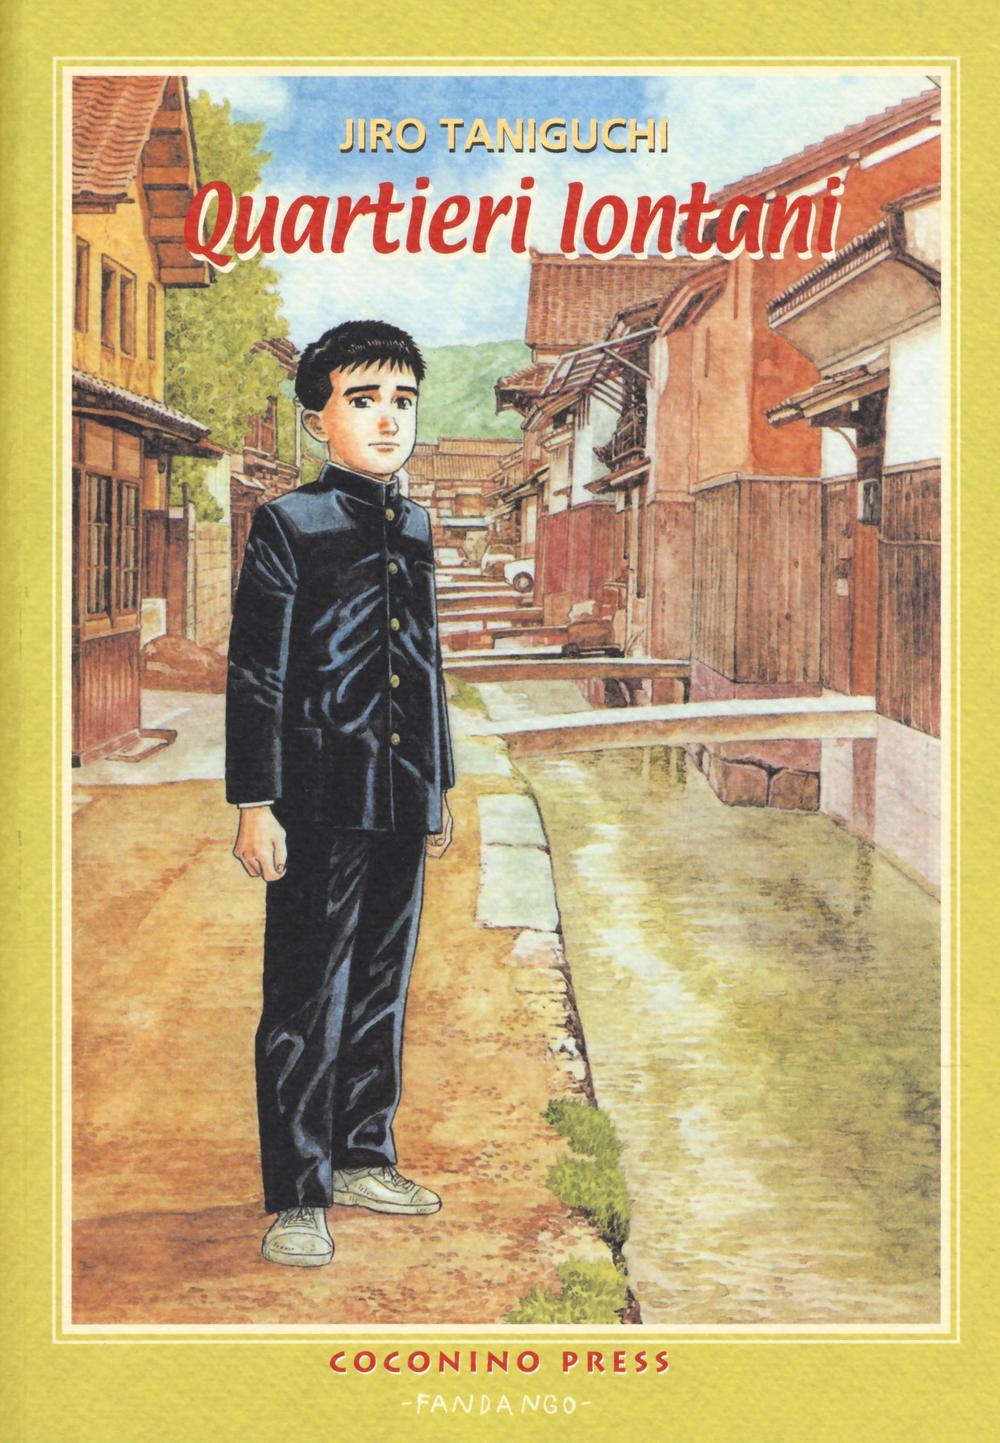 QUARTIERI LONTANI N.E. - JIRO TANIGUCHI - 9788876182990